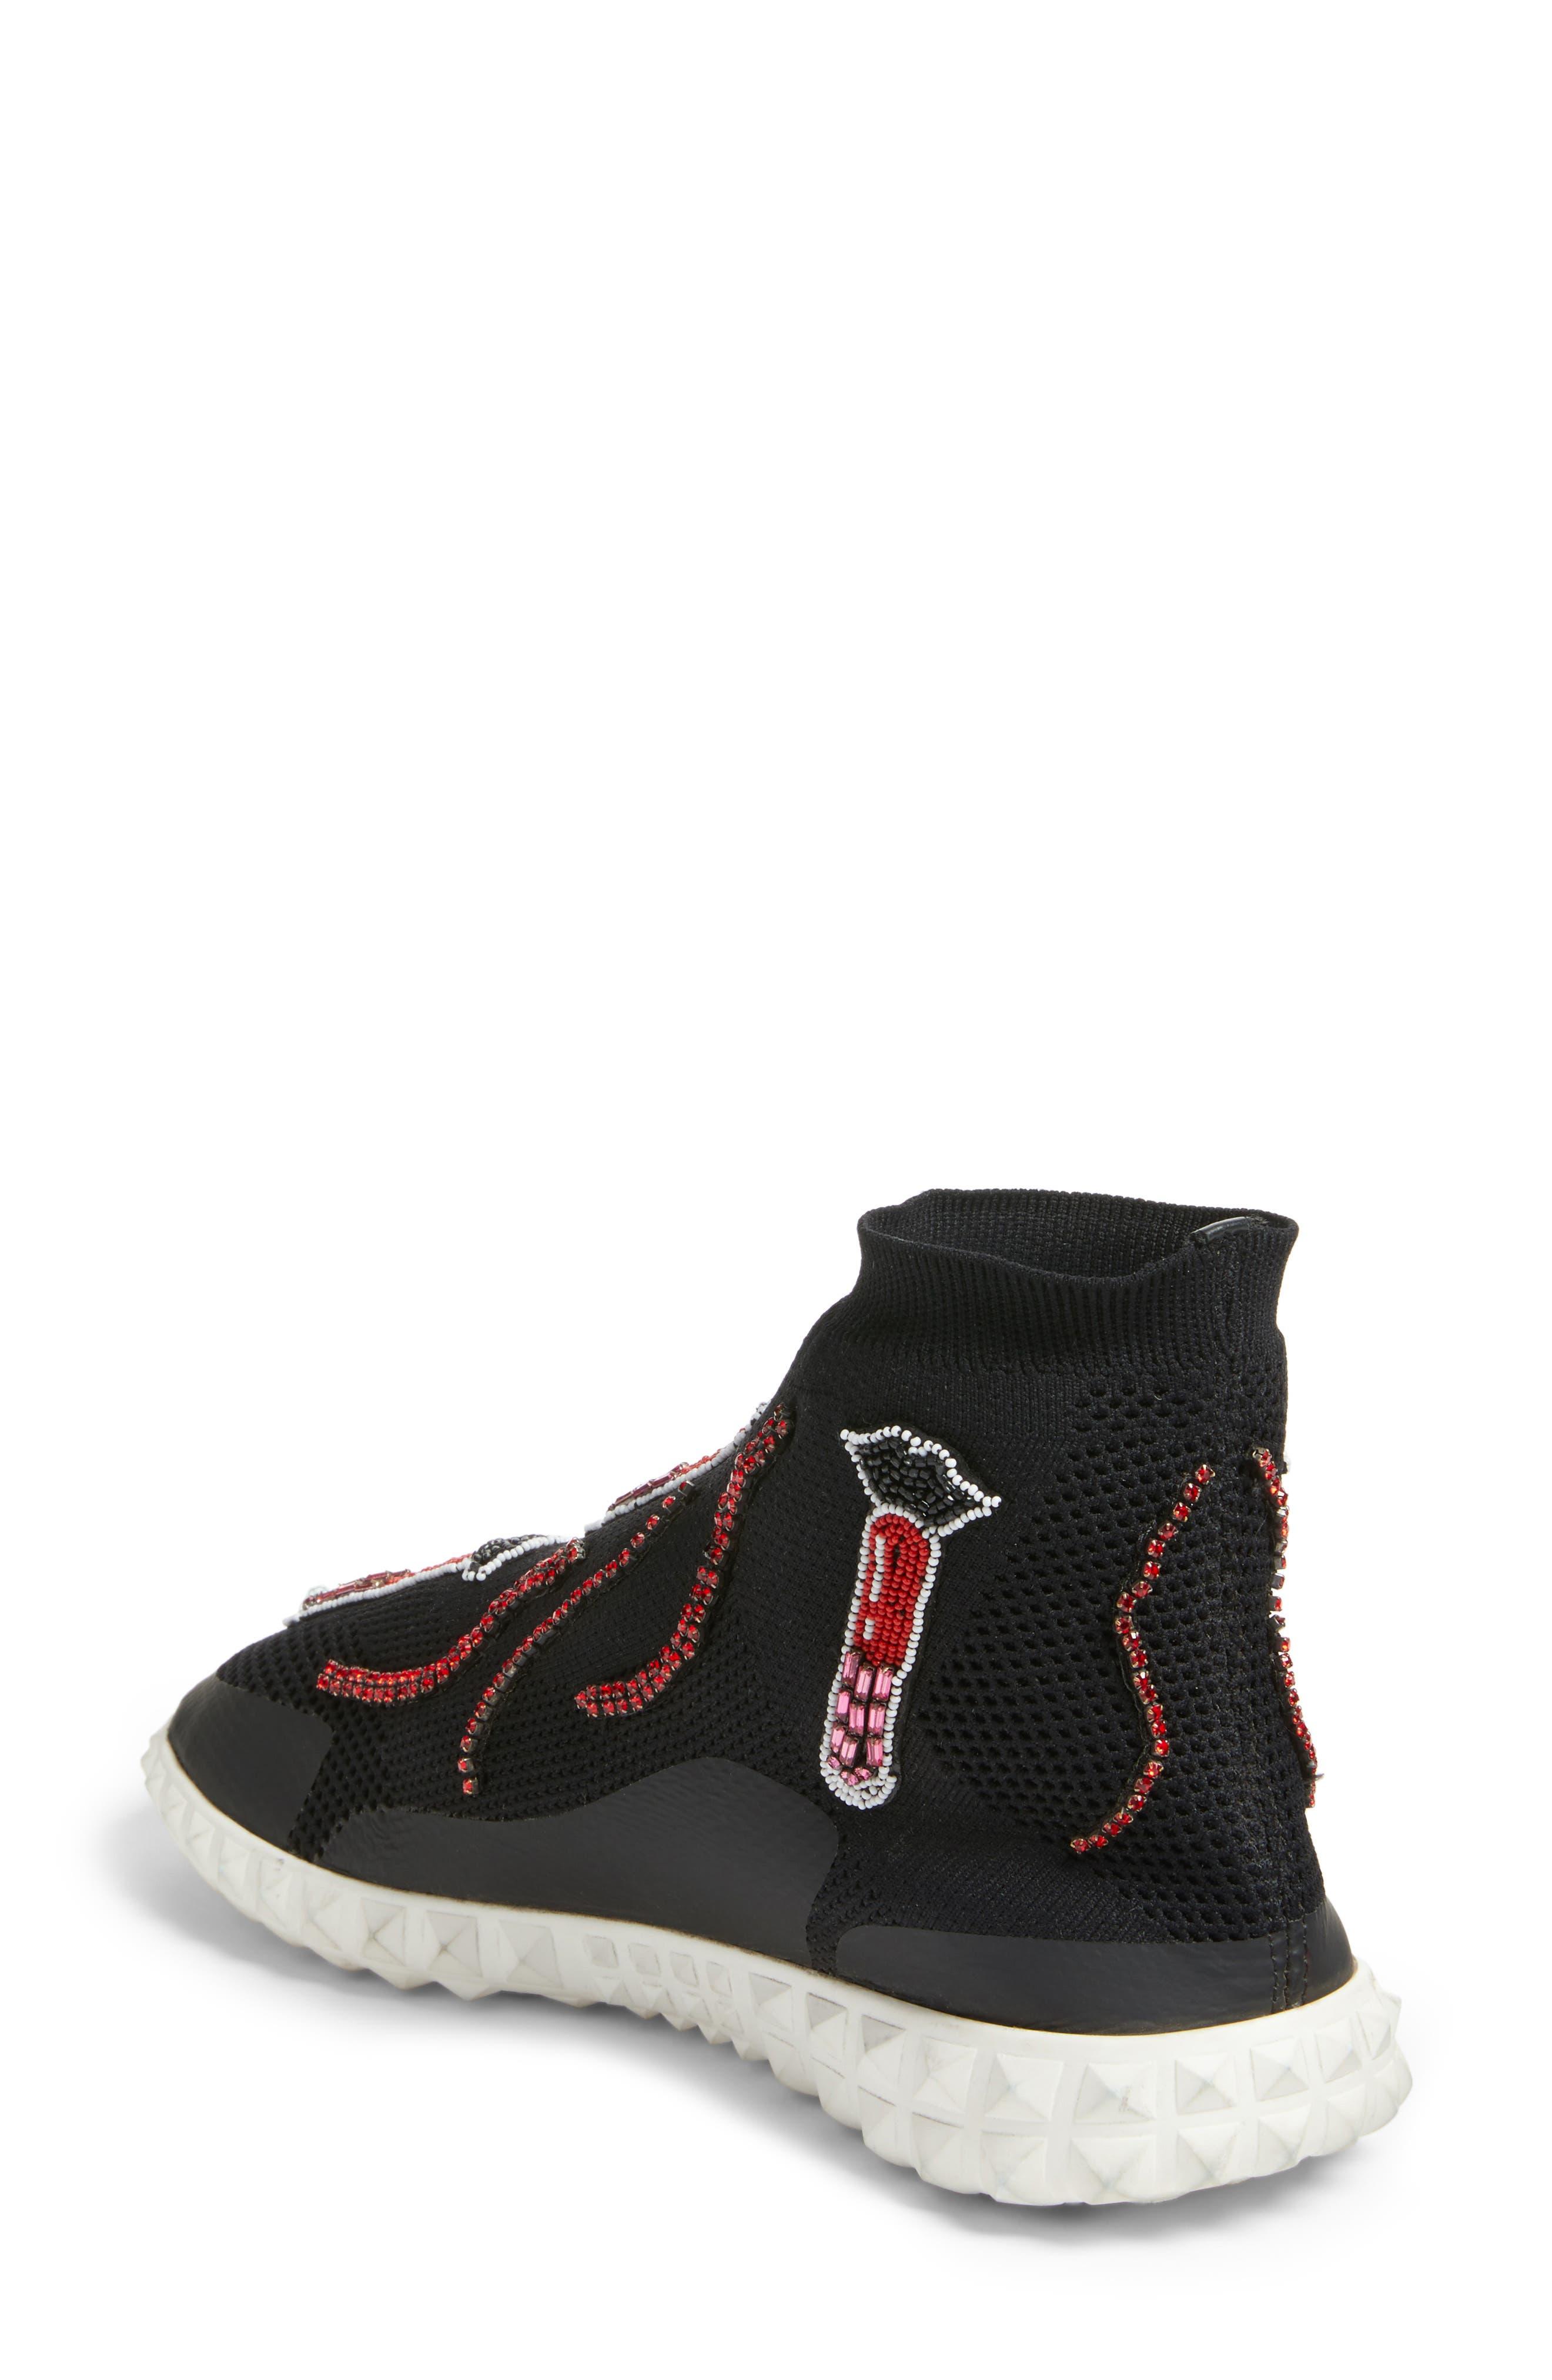 Lipstick Embellished High Top Sneaker,                             Alternate thumbnail 2, color,                             Black